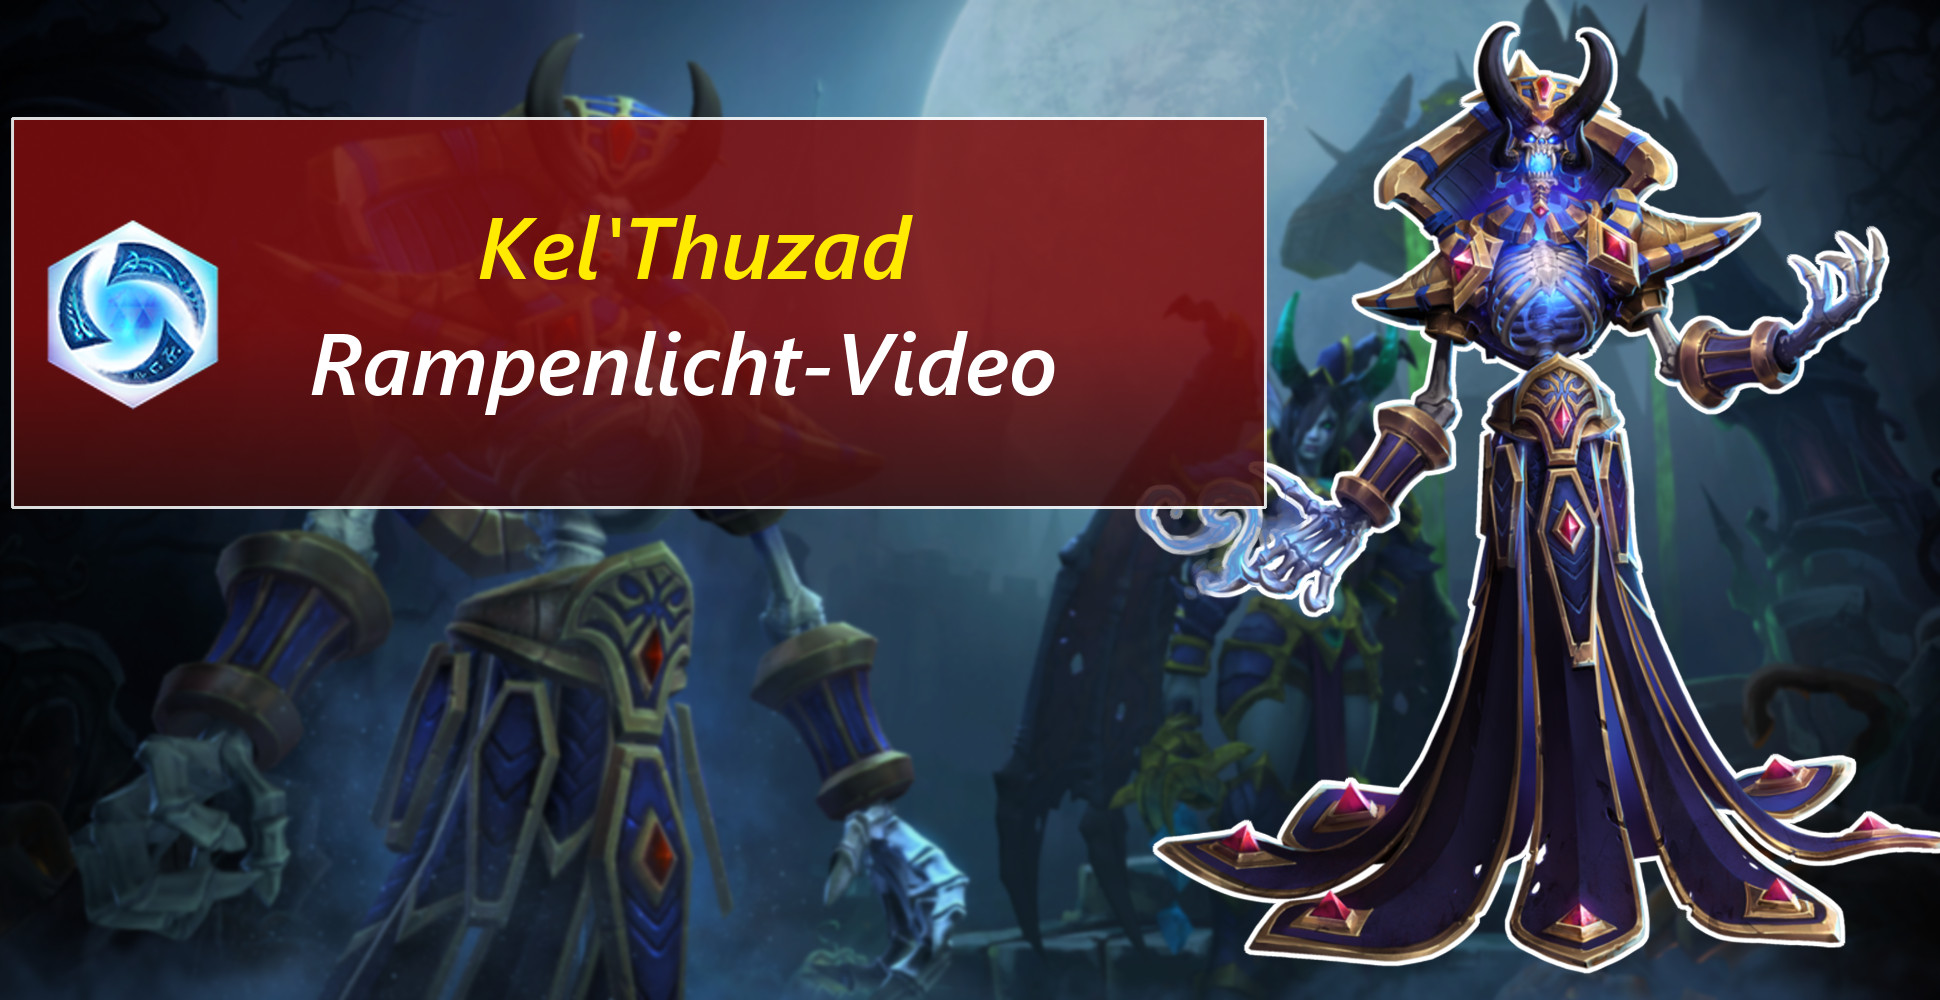 Heroes of the Storm: Tod und Verfall – Kel'Thuzads Fähigkeiten im Video